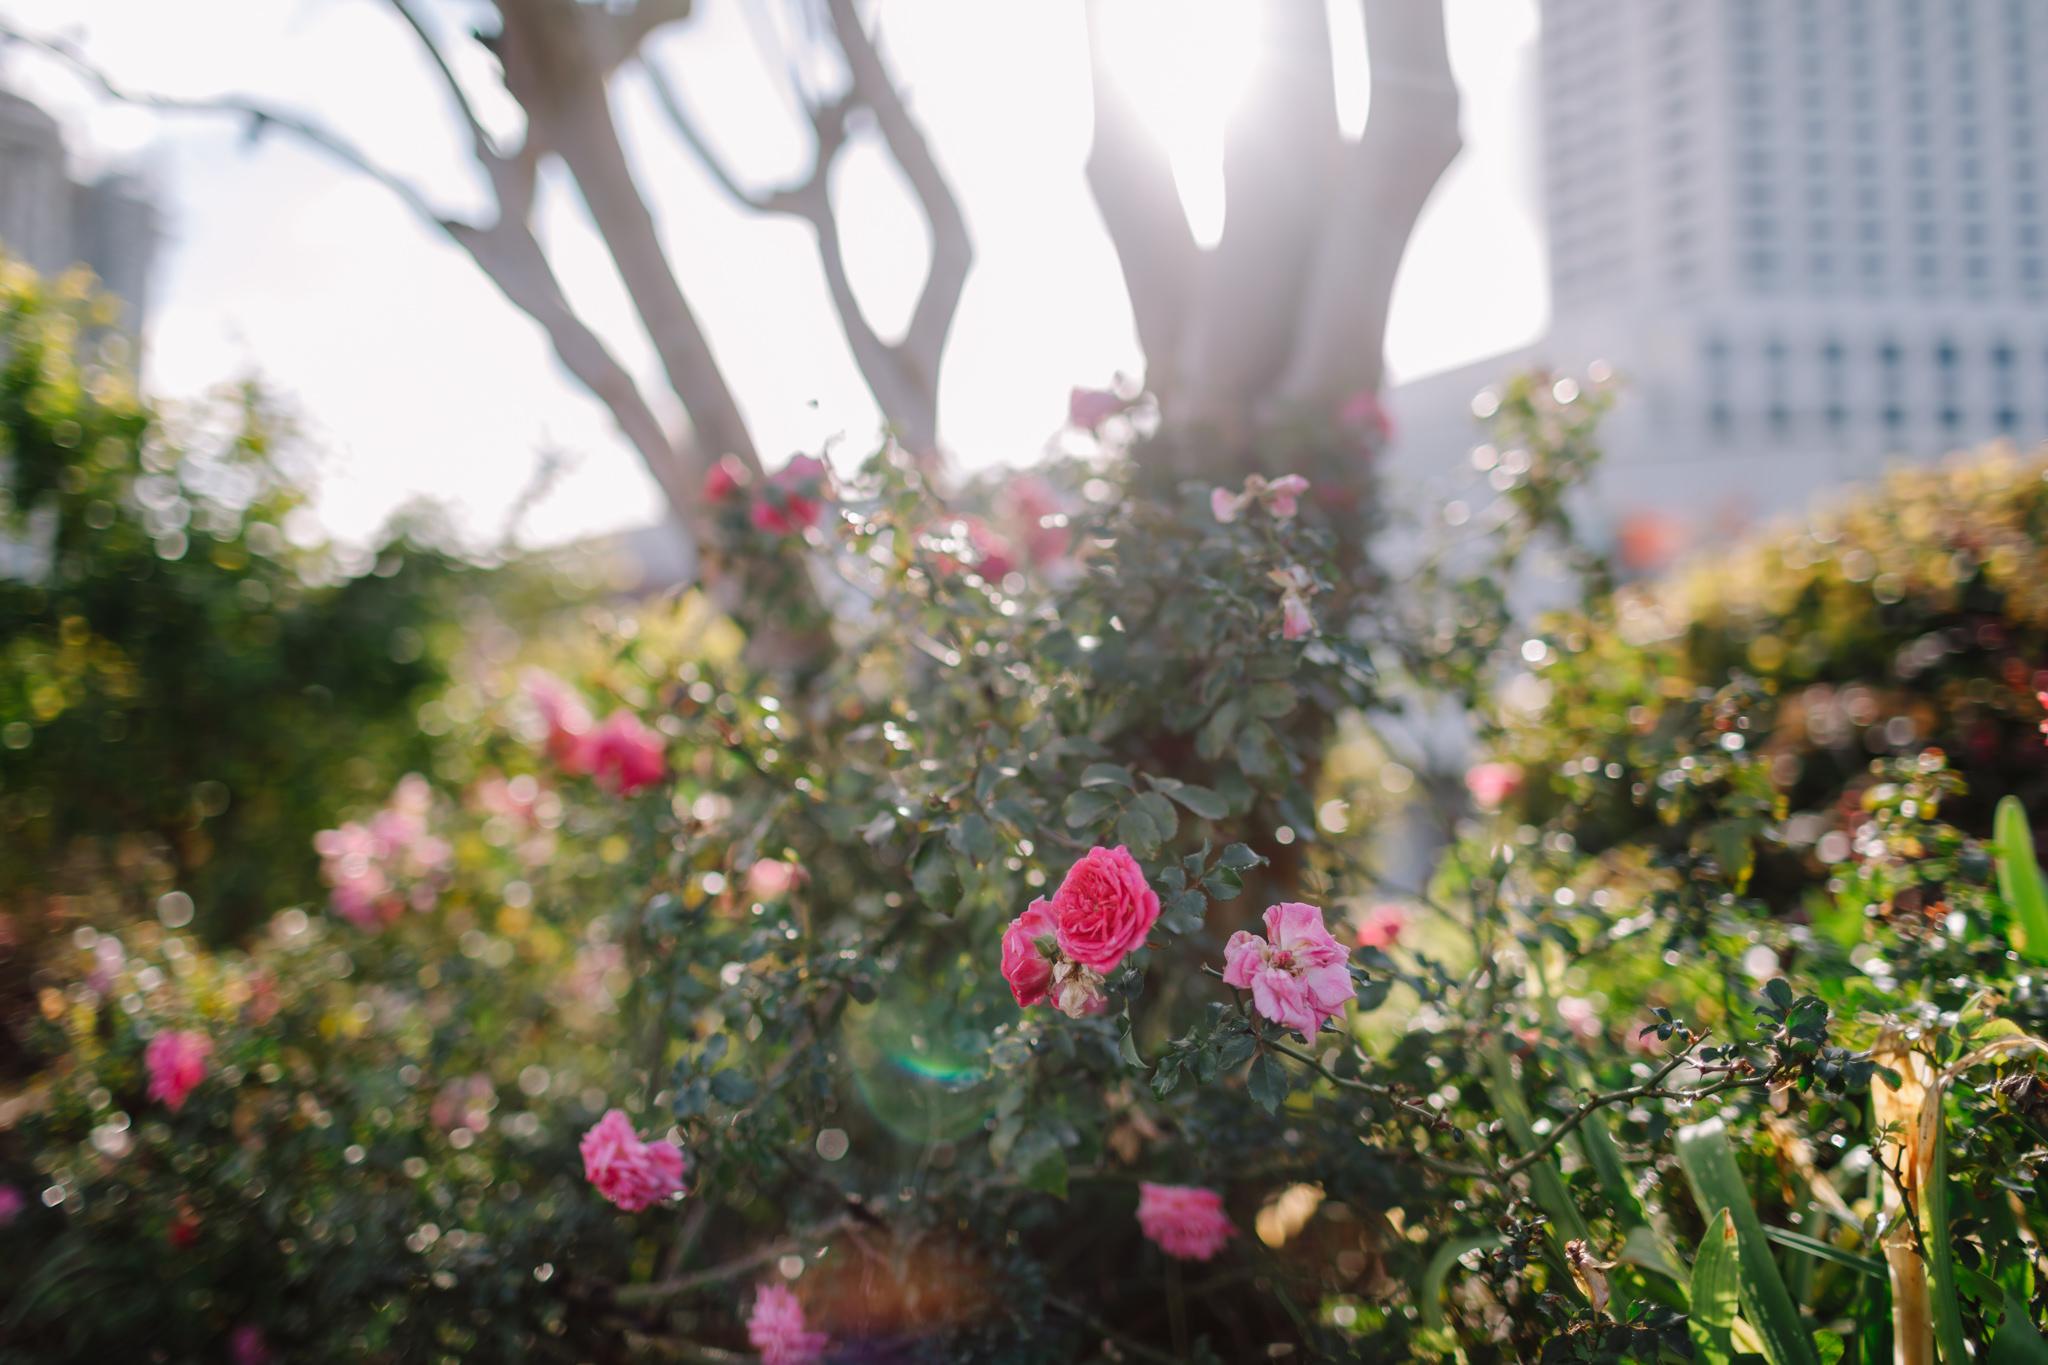 Sunlight on roses in New Orleans